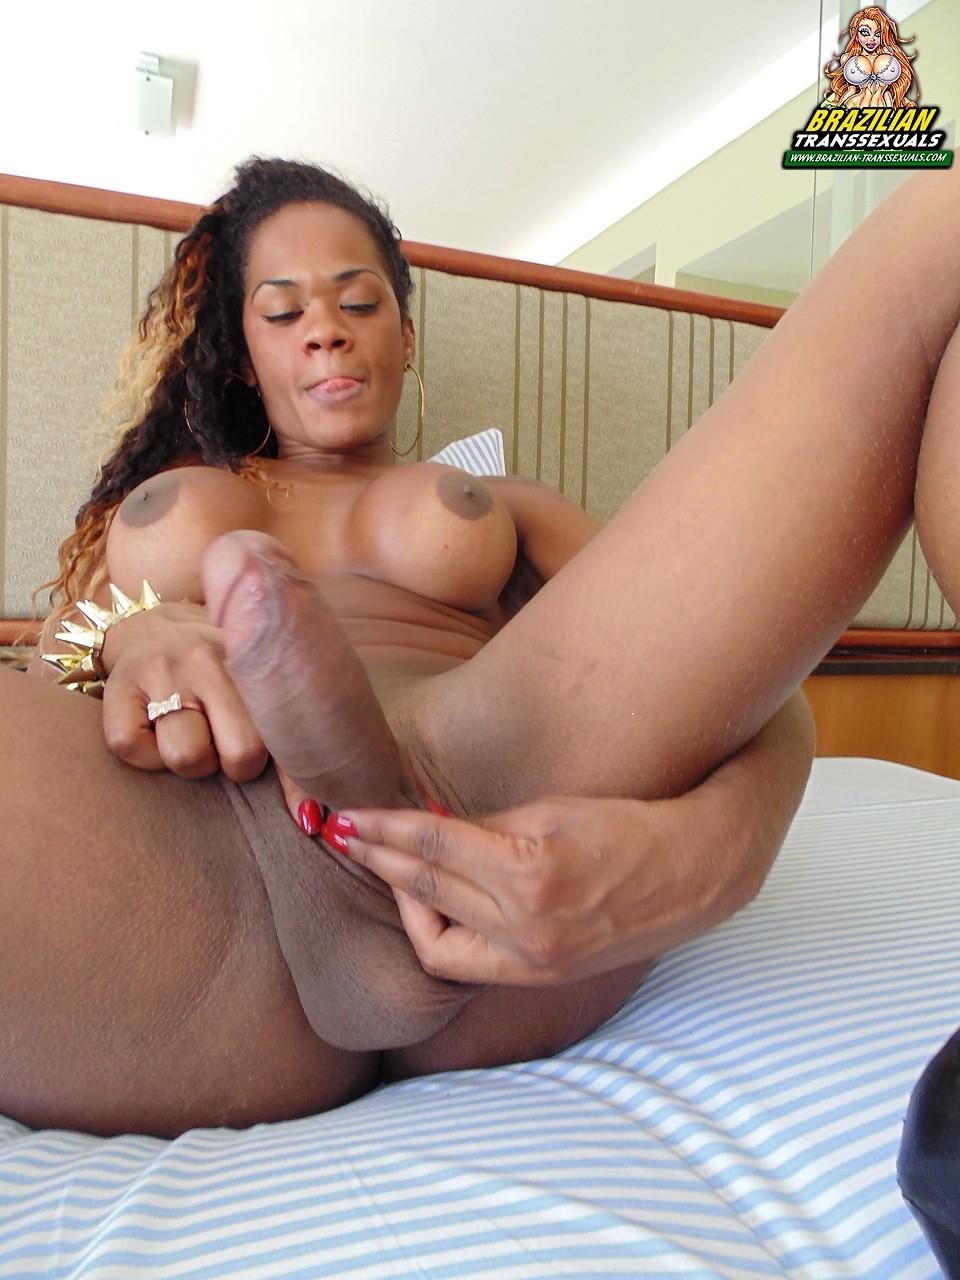 ebony shemale carol dias from brazil posing her big tool